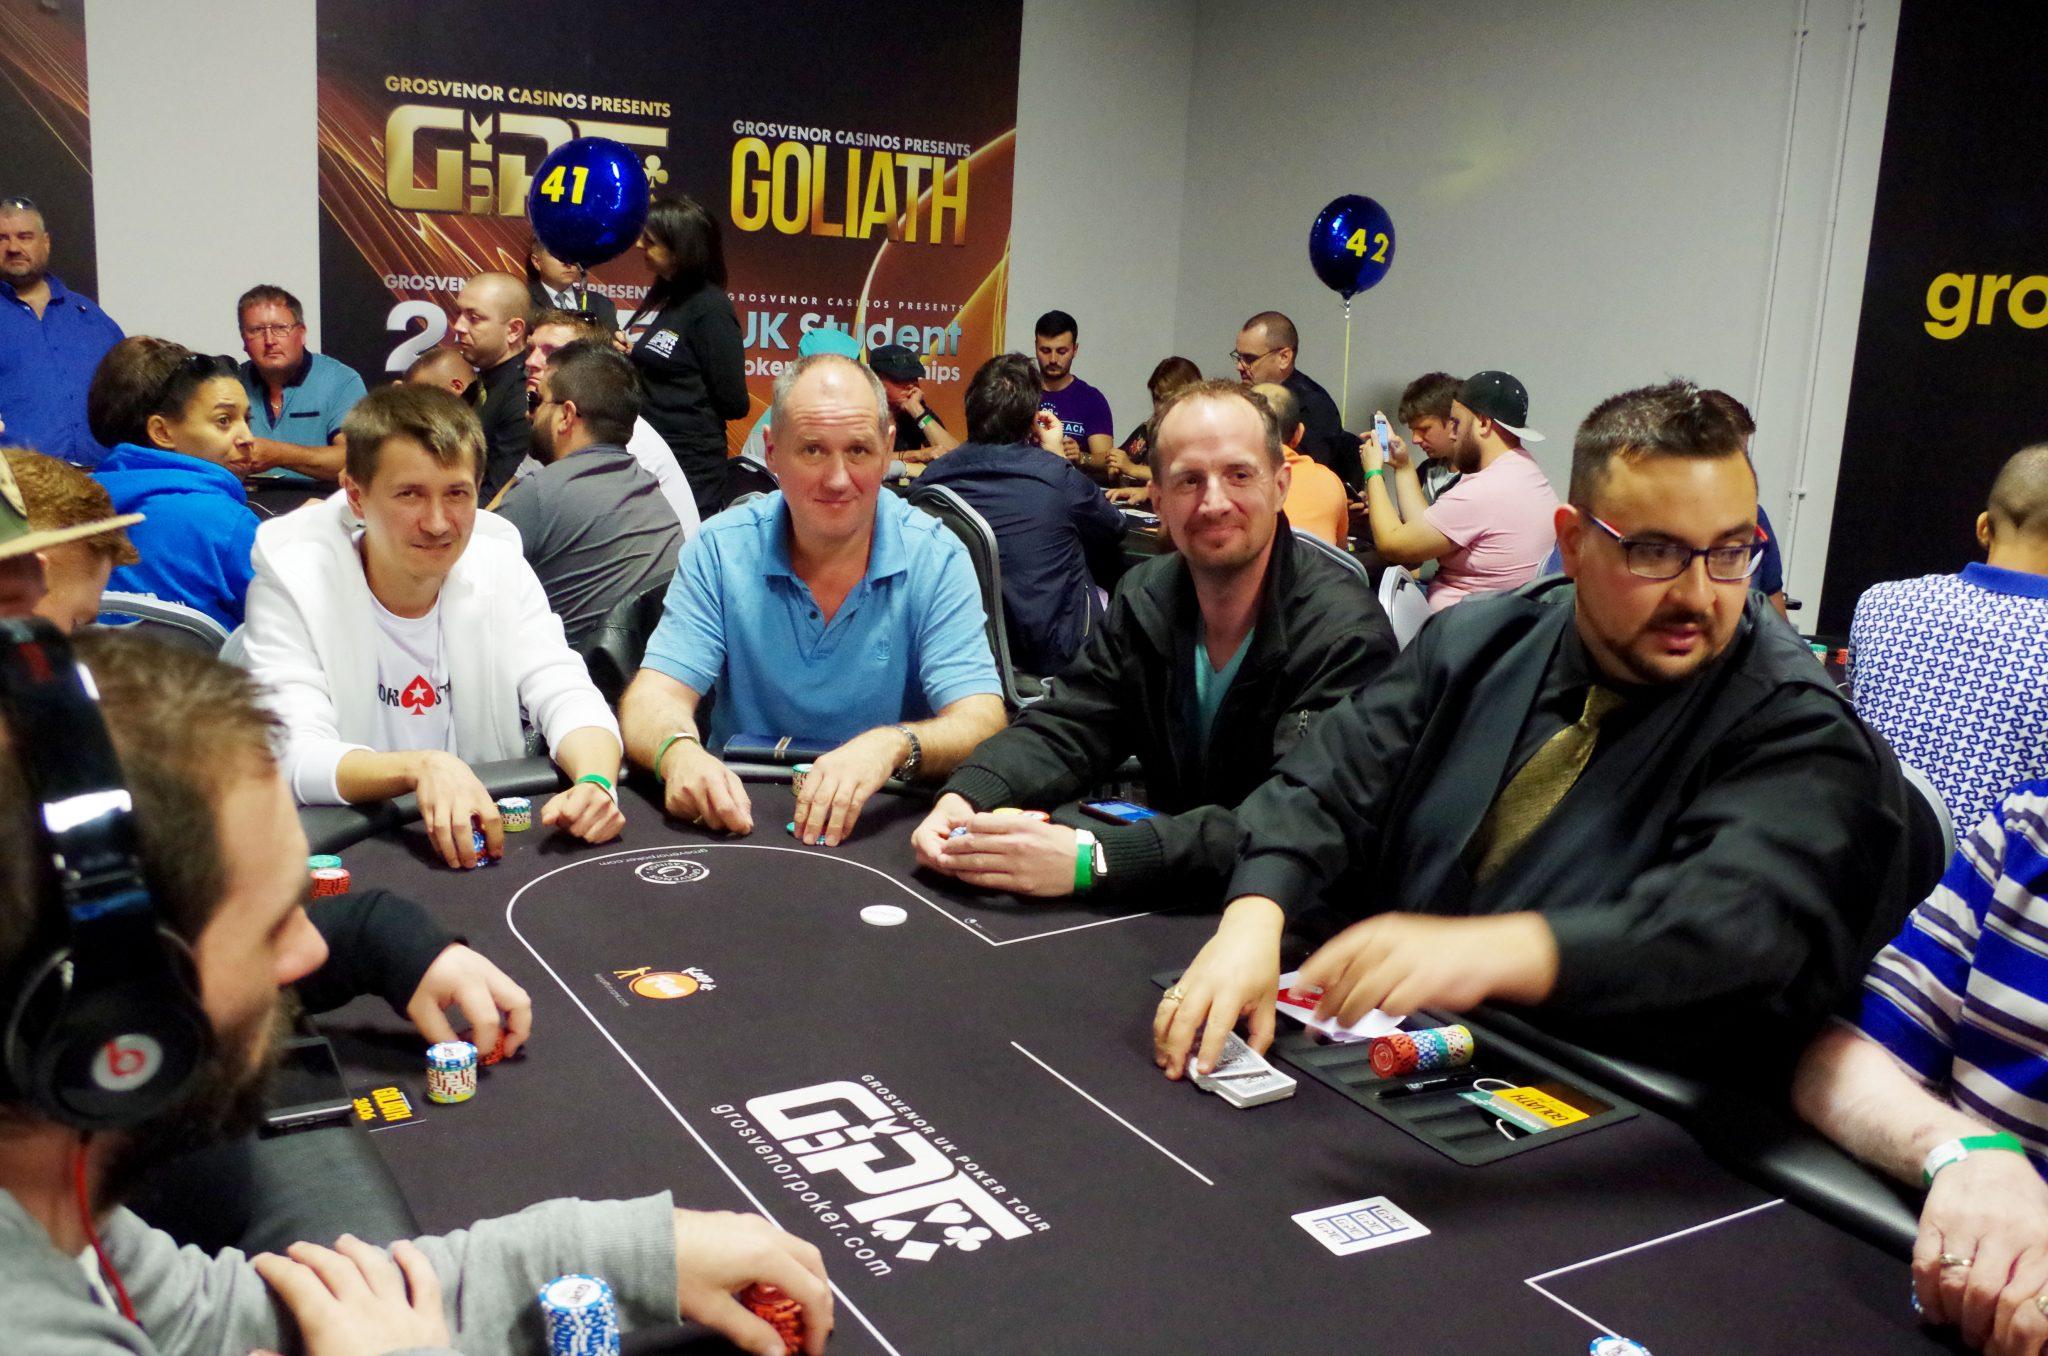 Grosvenor poker tour 2017 big brother australia time slot